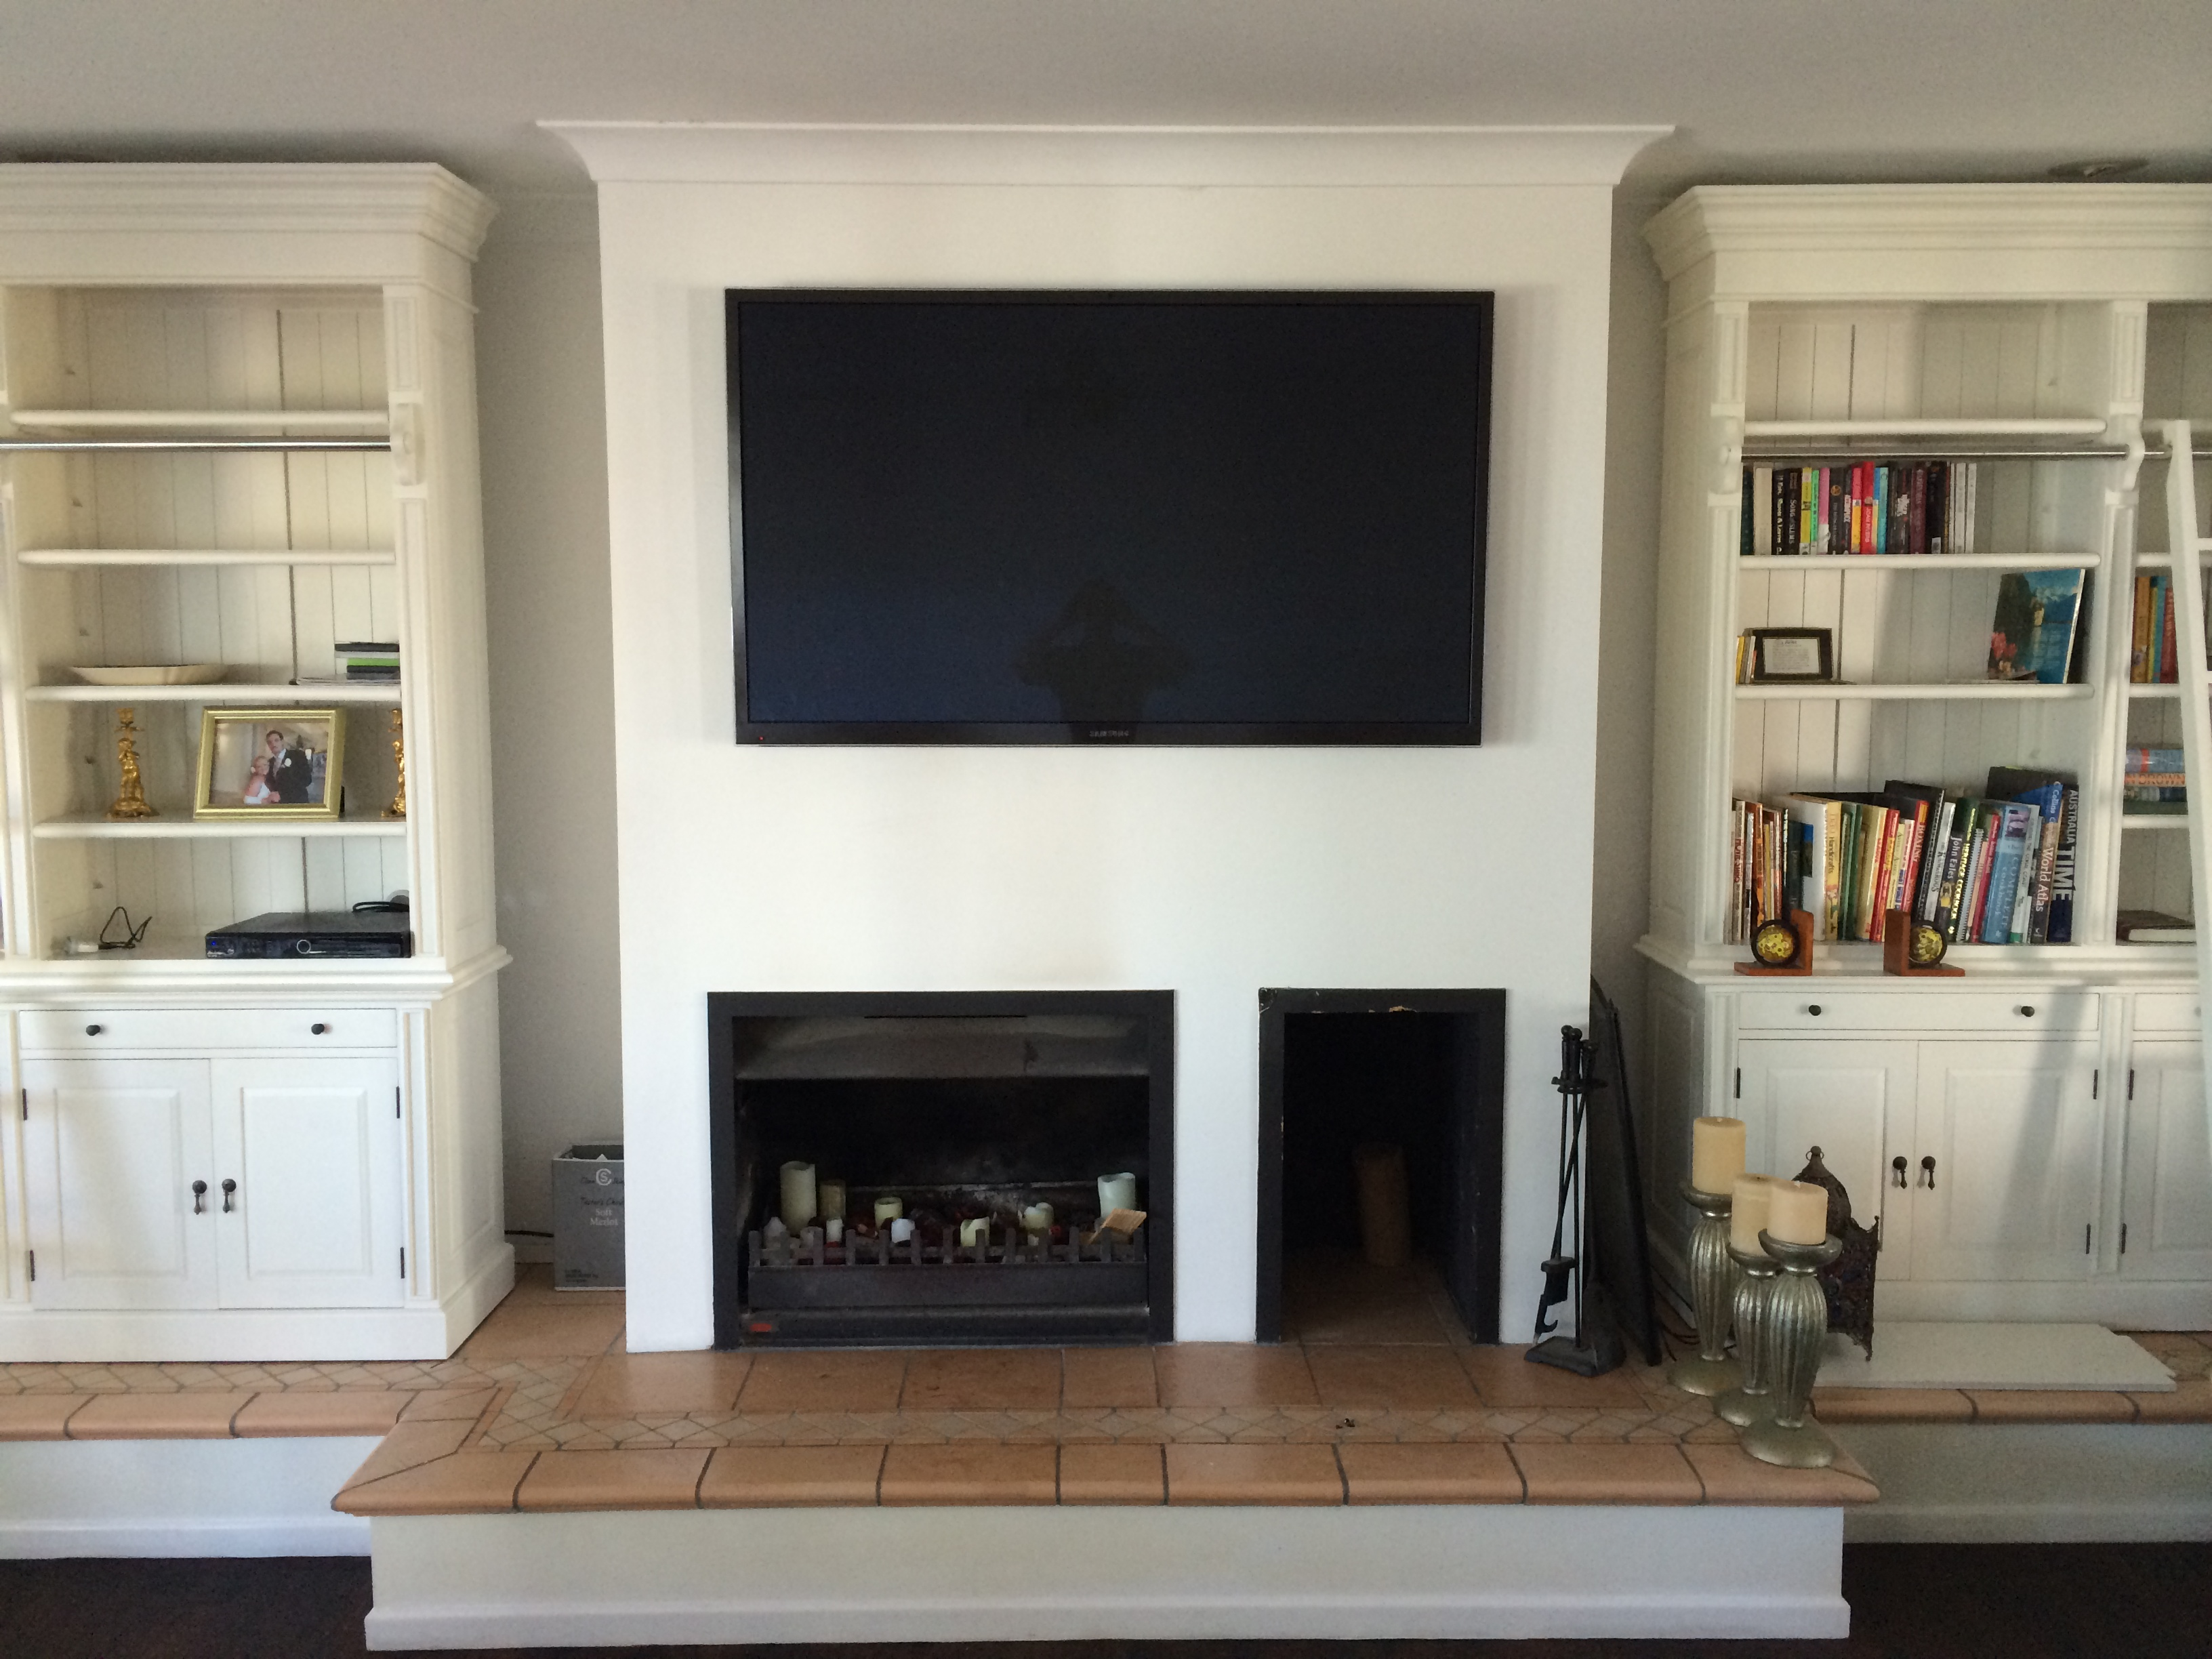 Tv wall mounting brisbane wynne 39 s home electronicswynne - Tv wall mount over fireplace ...